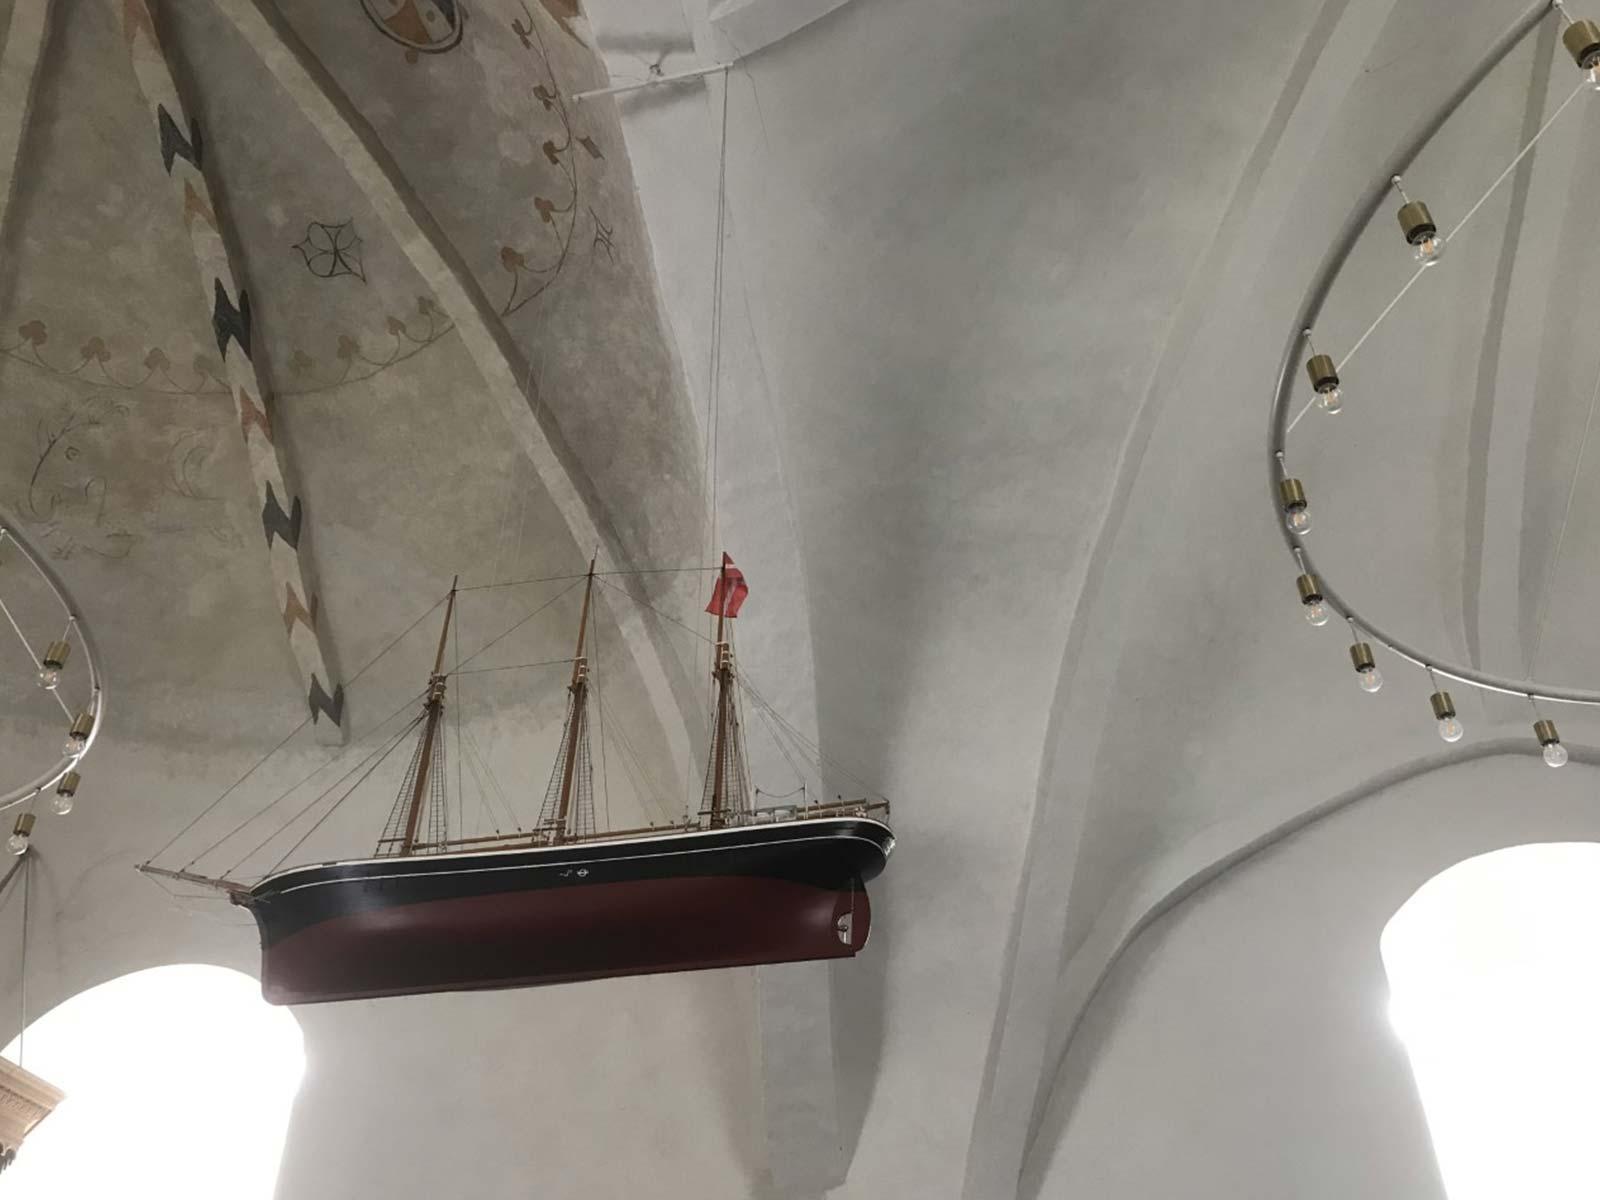 Skrøbelev Kirke kirkeskib